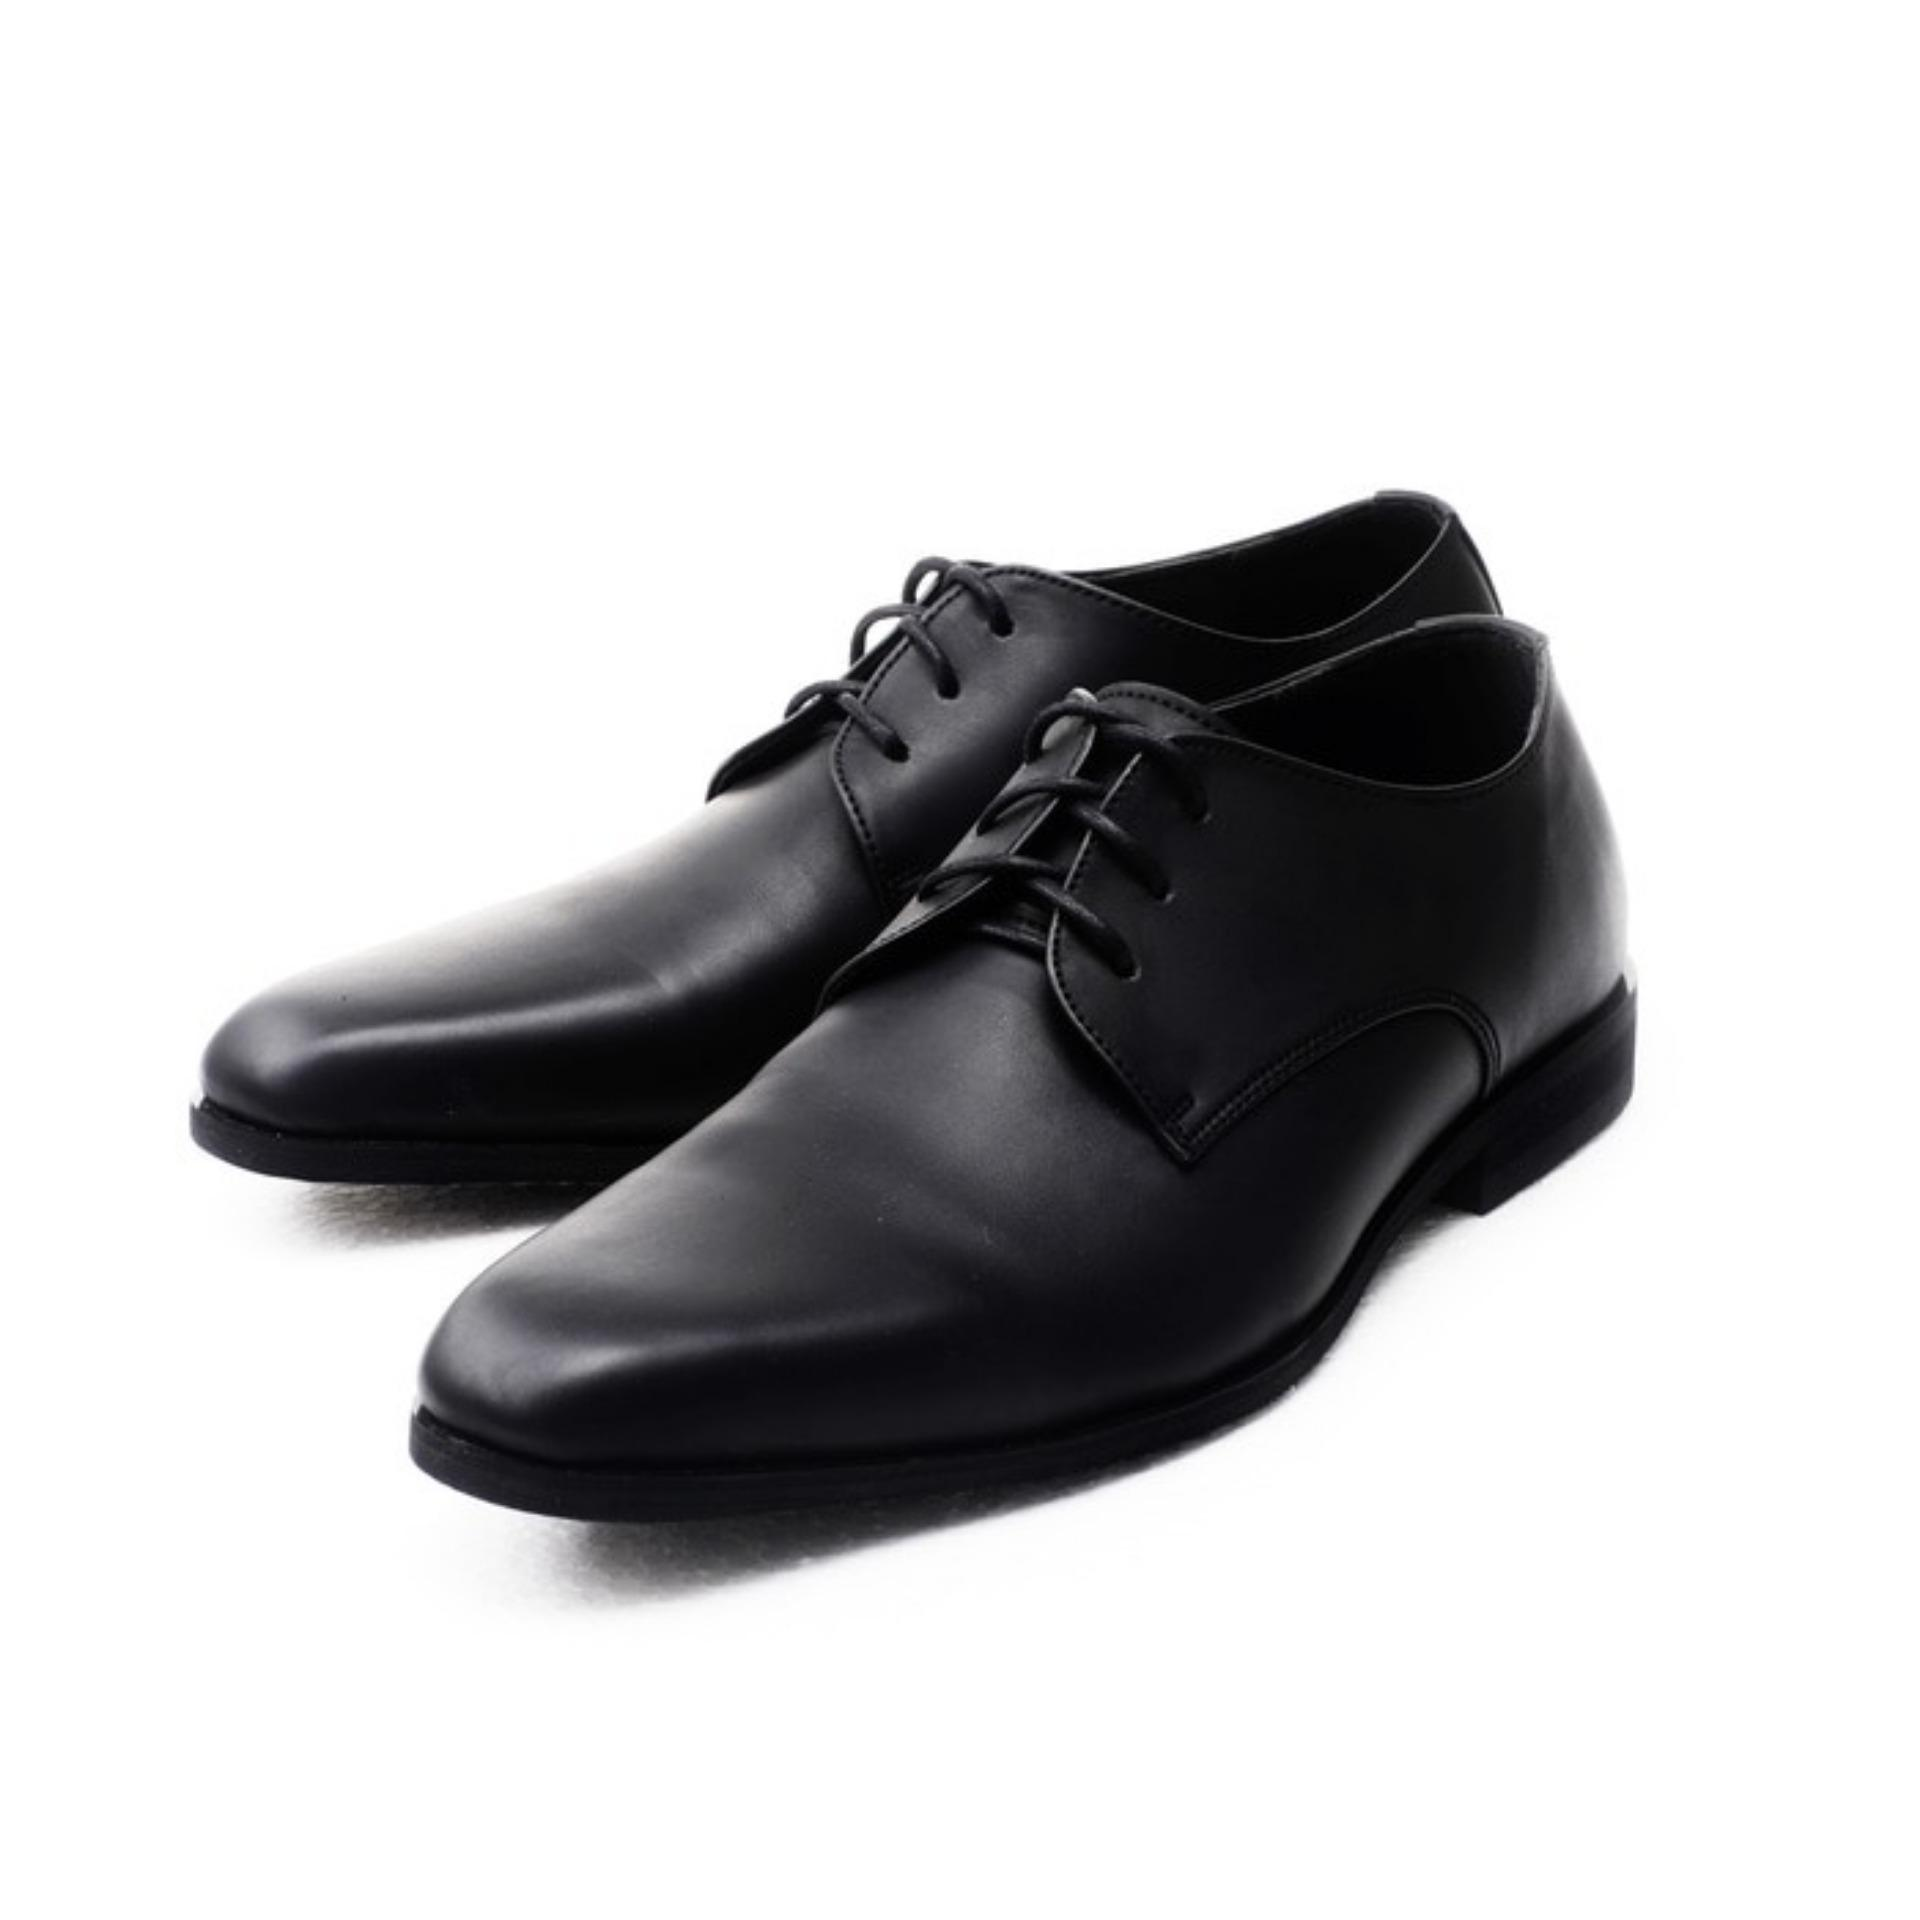 Sepatu Kerja Pria Kantor Pantofel Kulit Sintetis Model Tali - Black